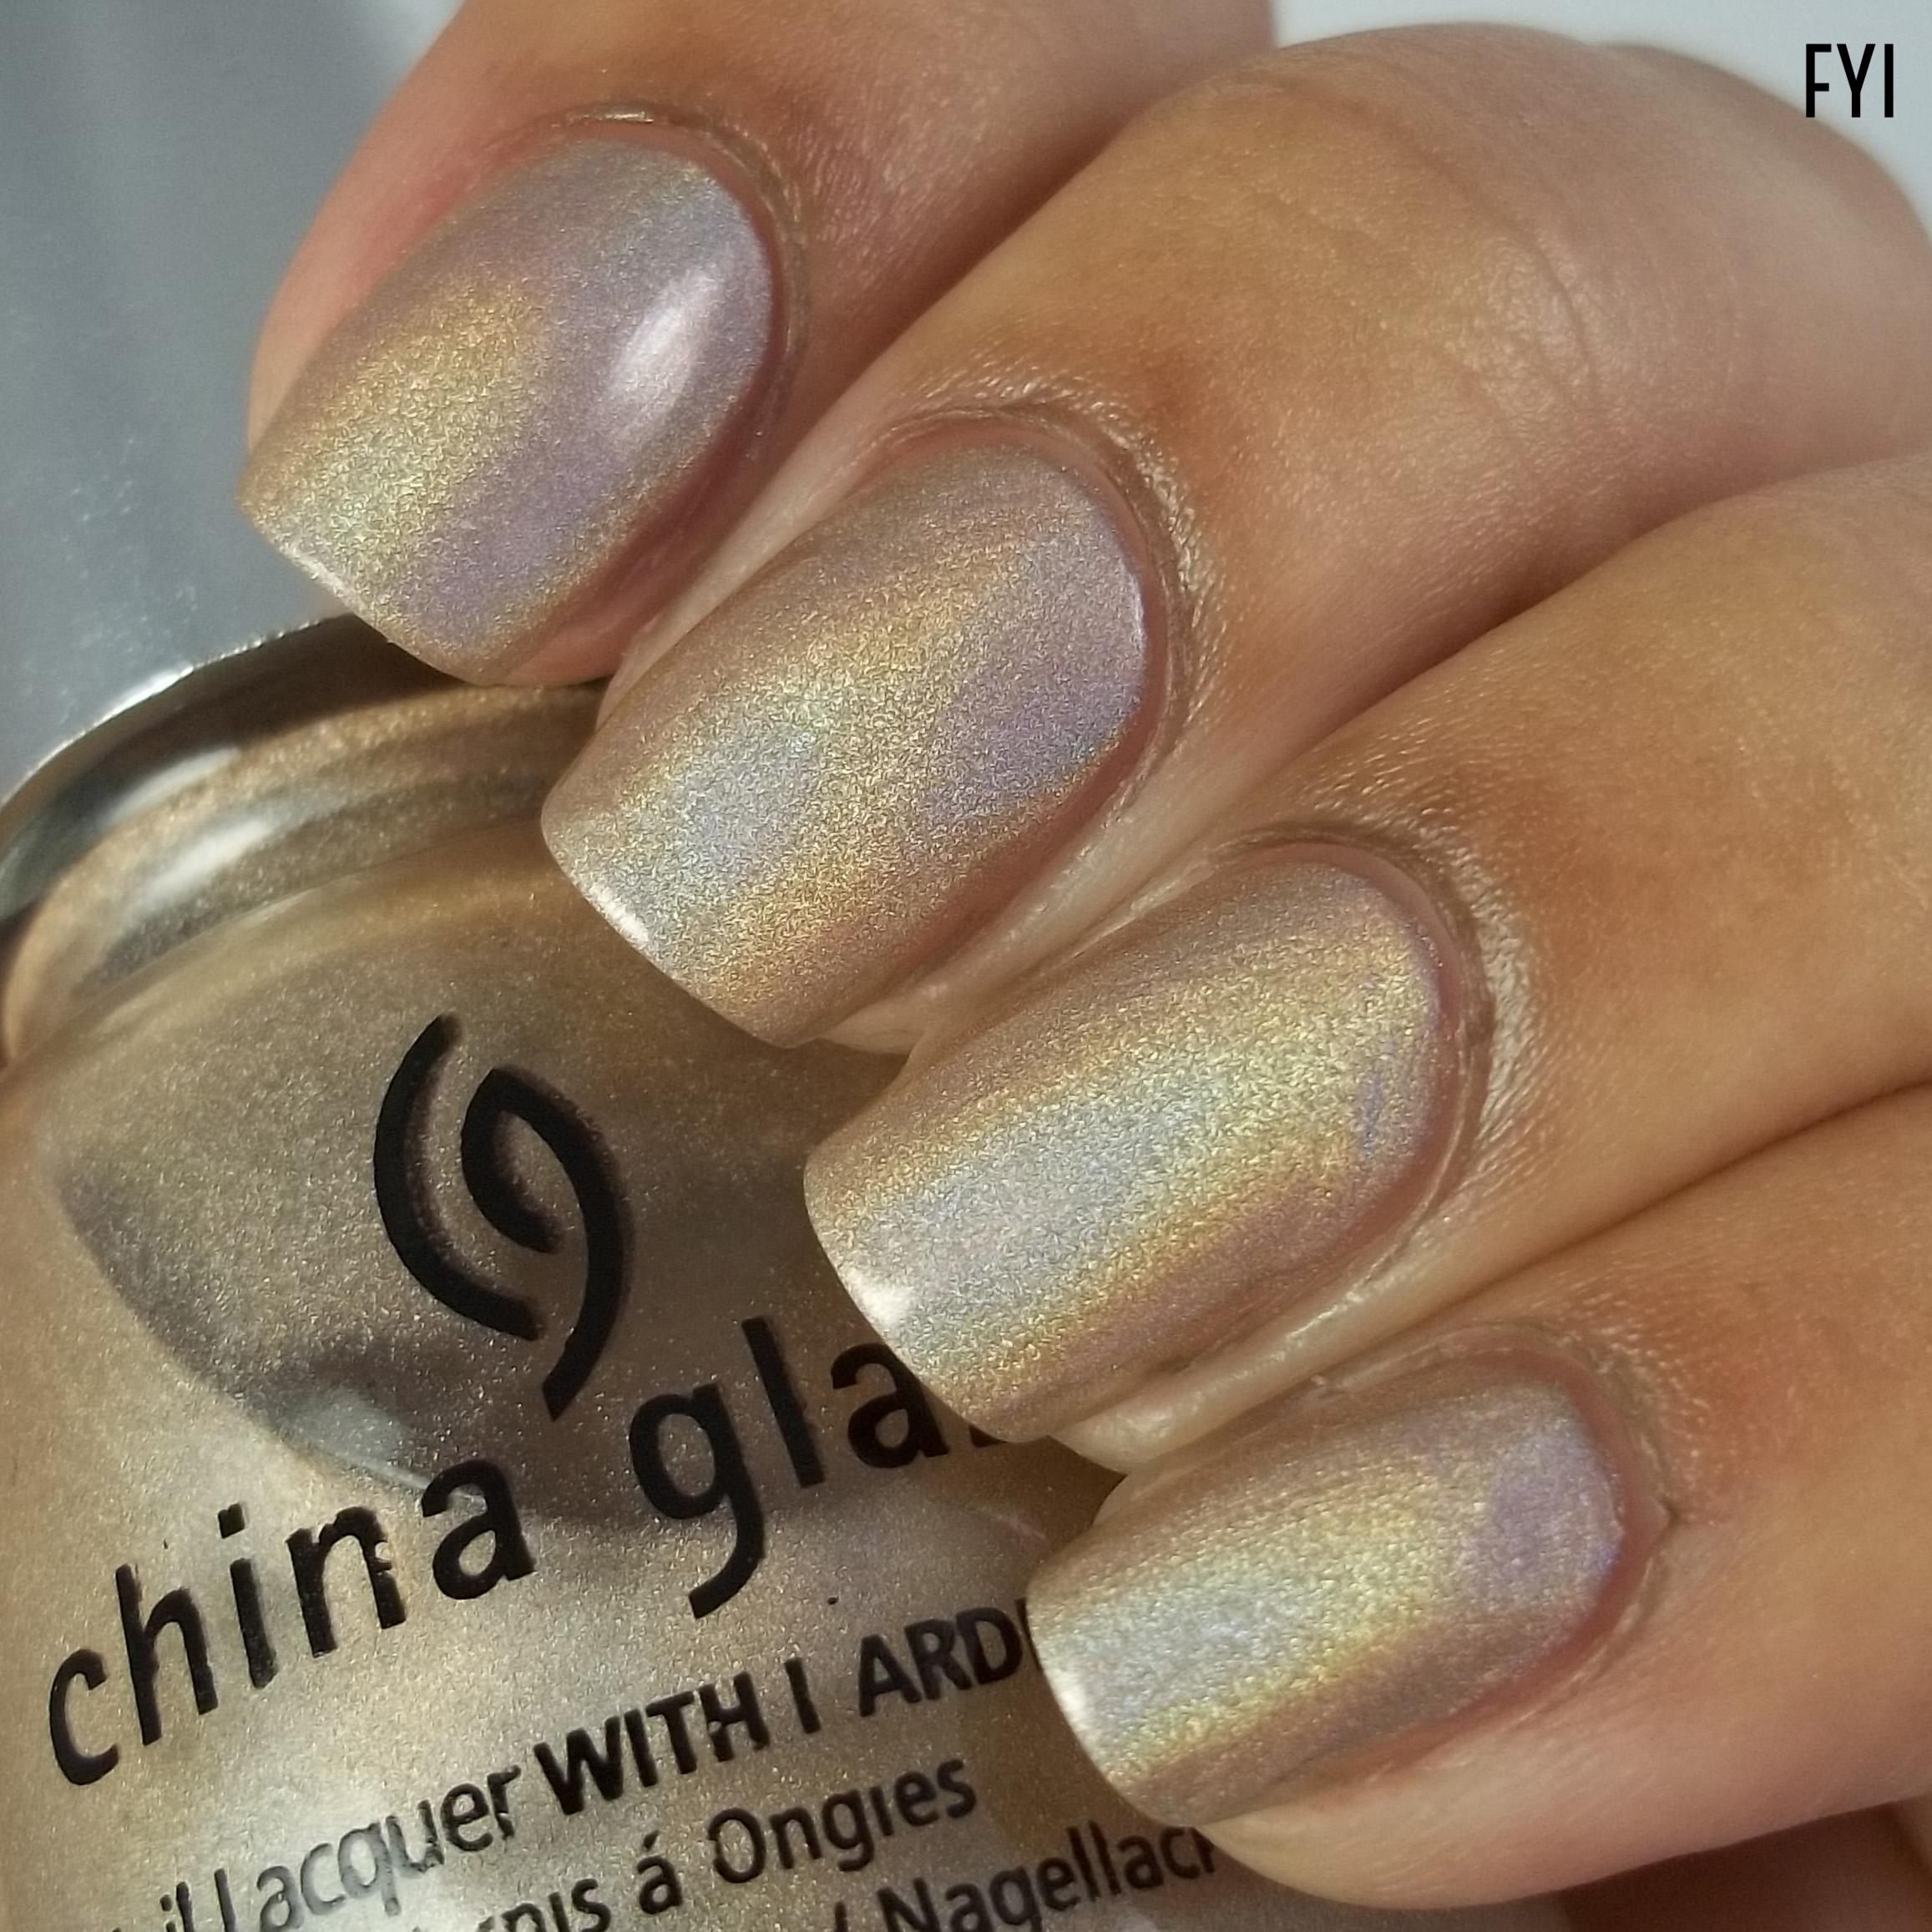 China Glaze OMG - FYI.jpg